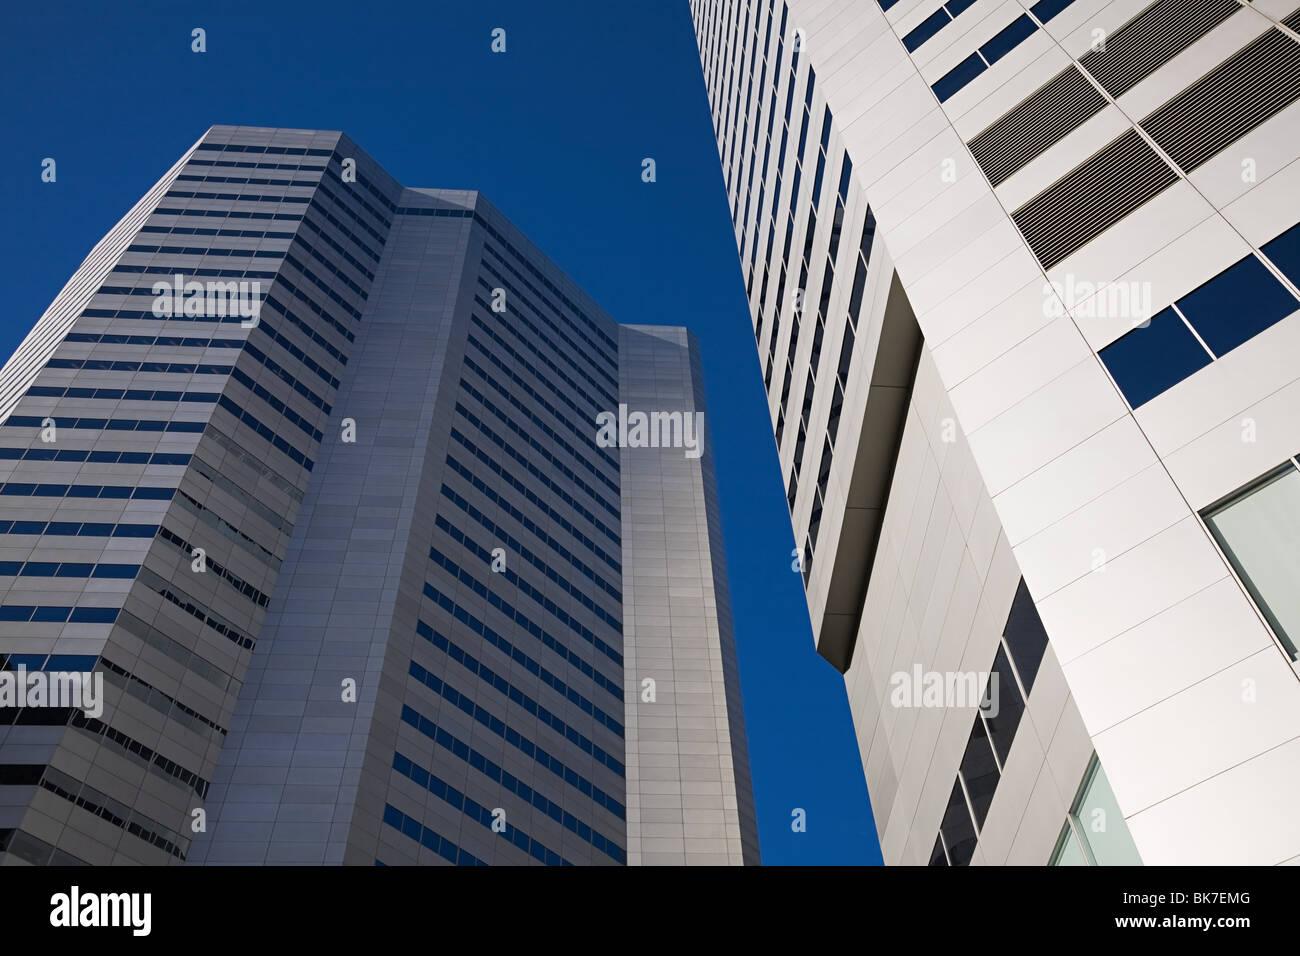 Edificios de oficinas Imagen De Stock